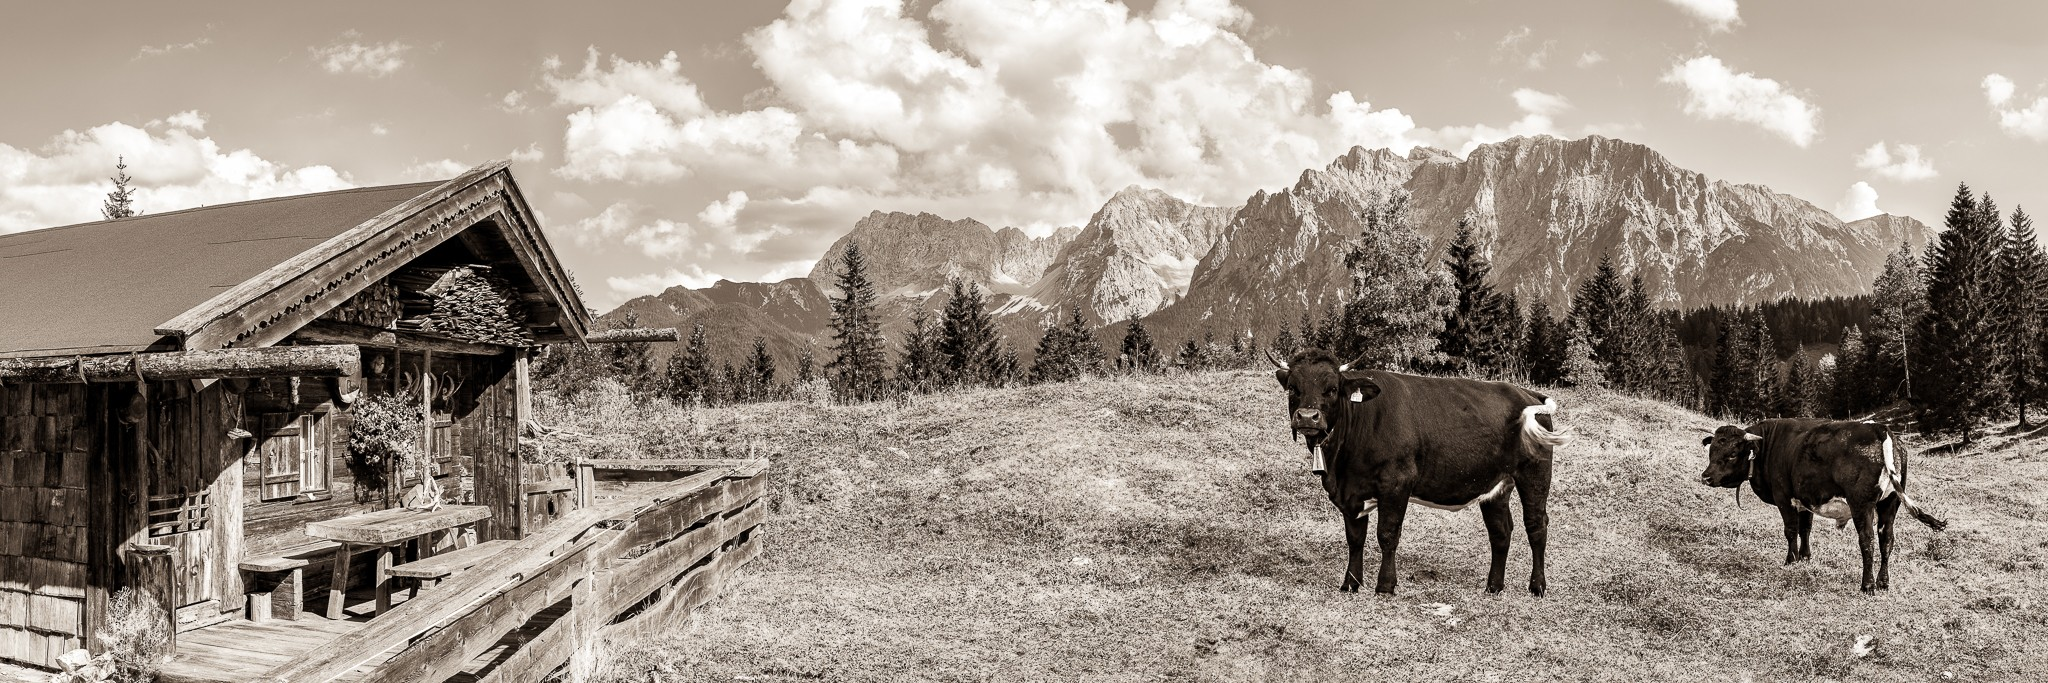 Alm mit Karwendelblick - Mittenwald Bergpanorama - Sepia